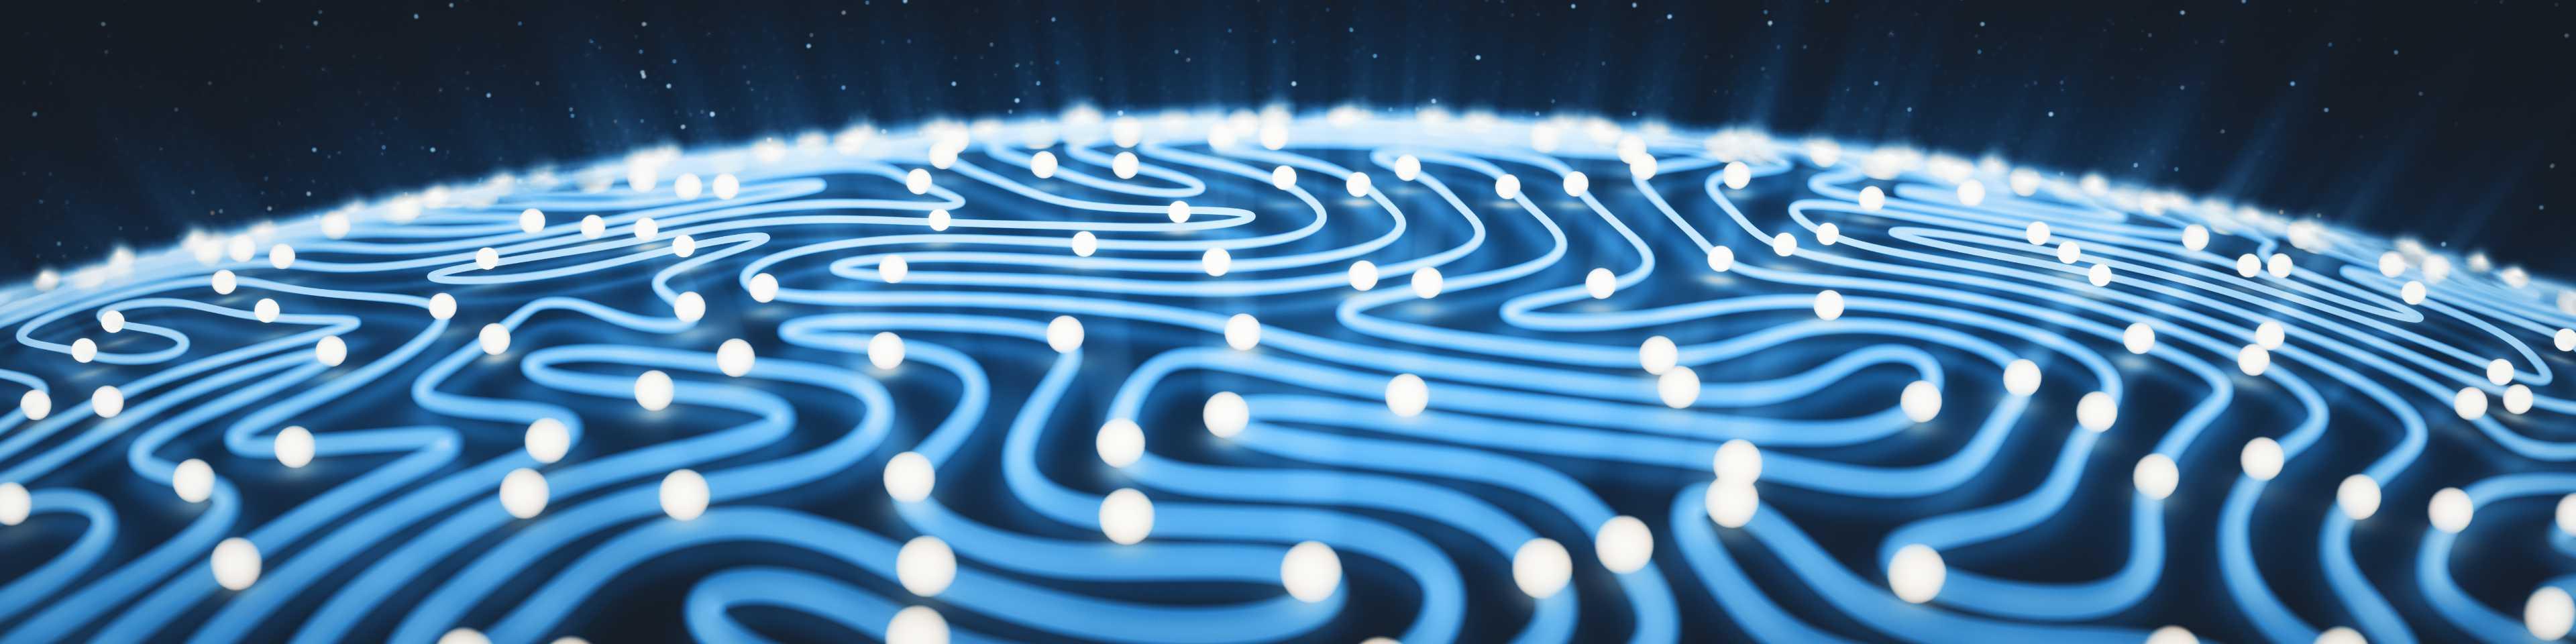 Digital brain texture